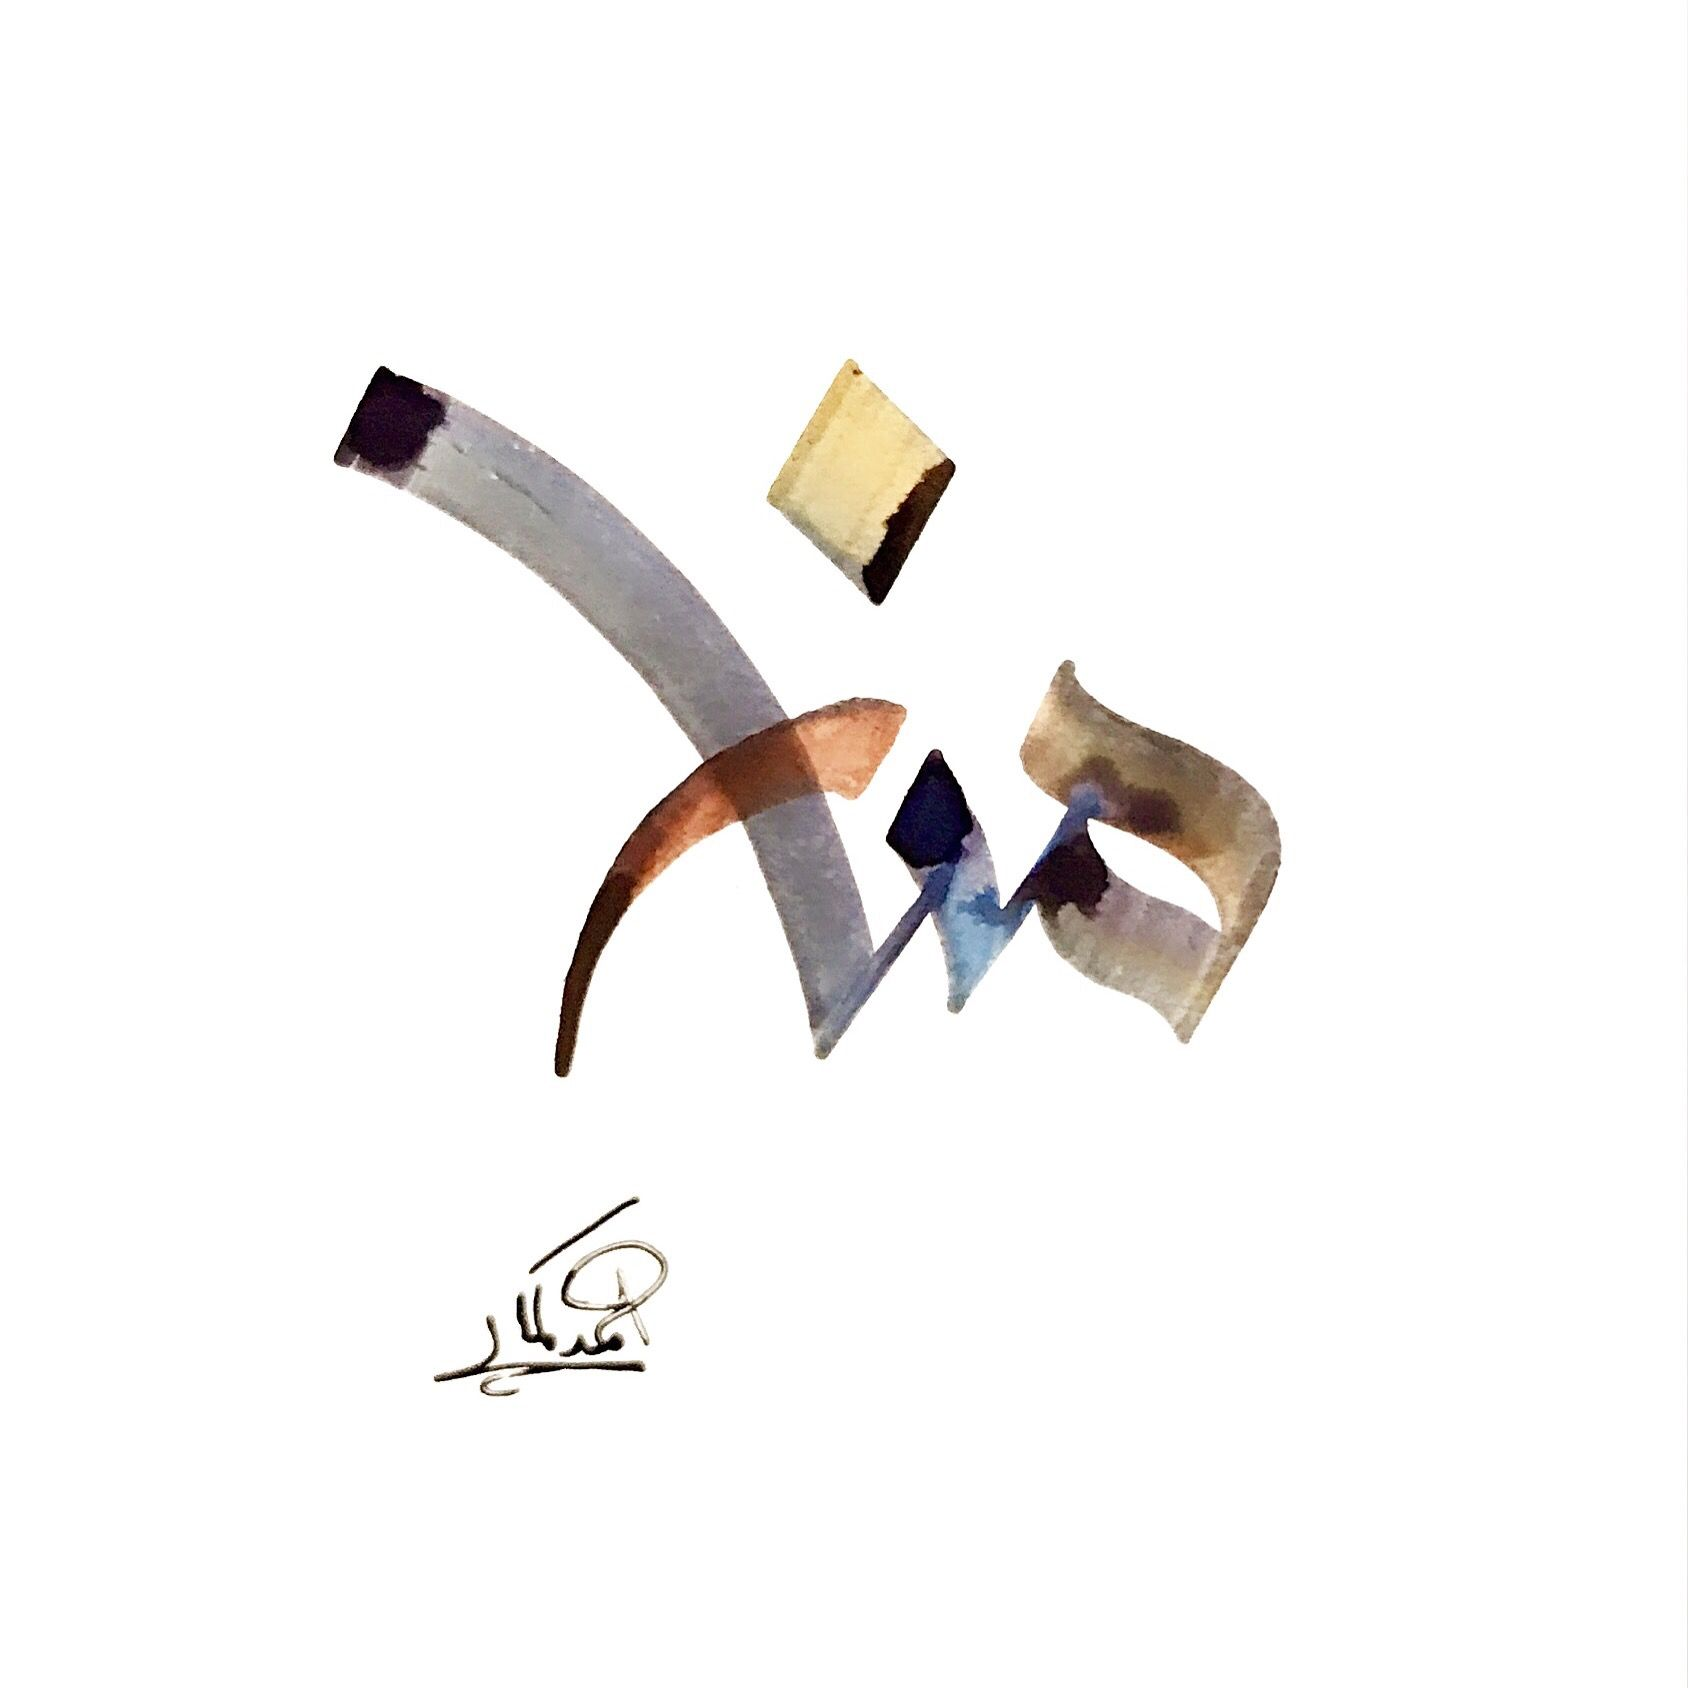 Pin By Ahmed Kamal On Name Typography تايبوجرافي Islamic Art Calligraphy Arabic Calligraphy Art Islamic Art